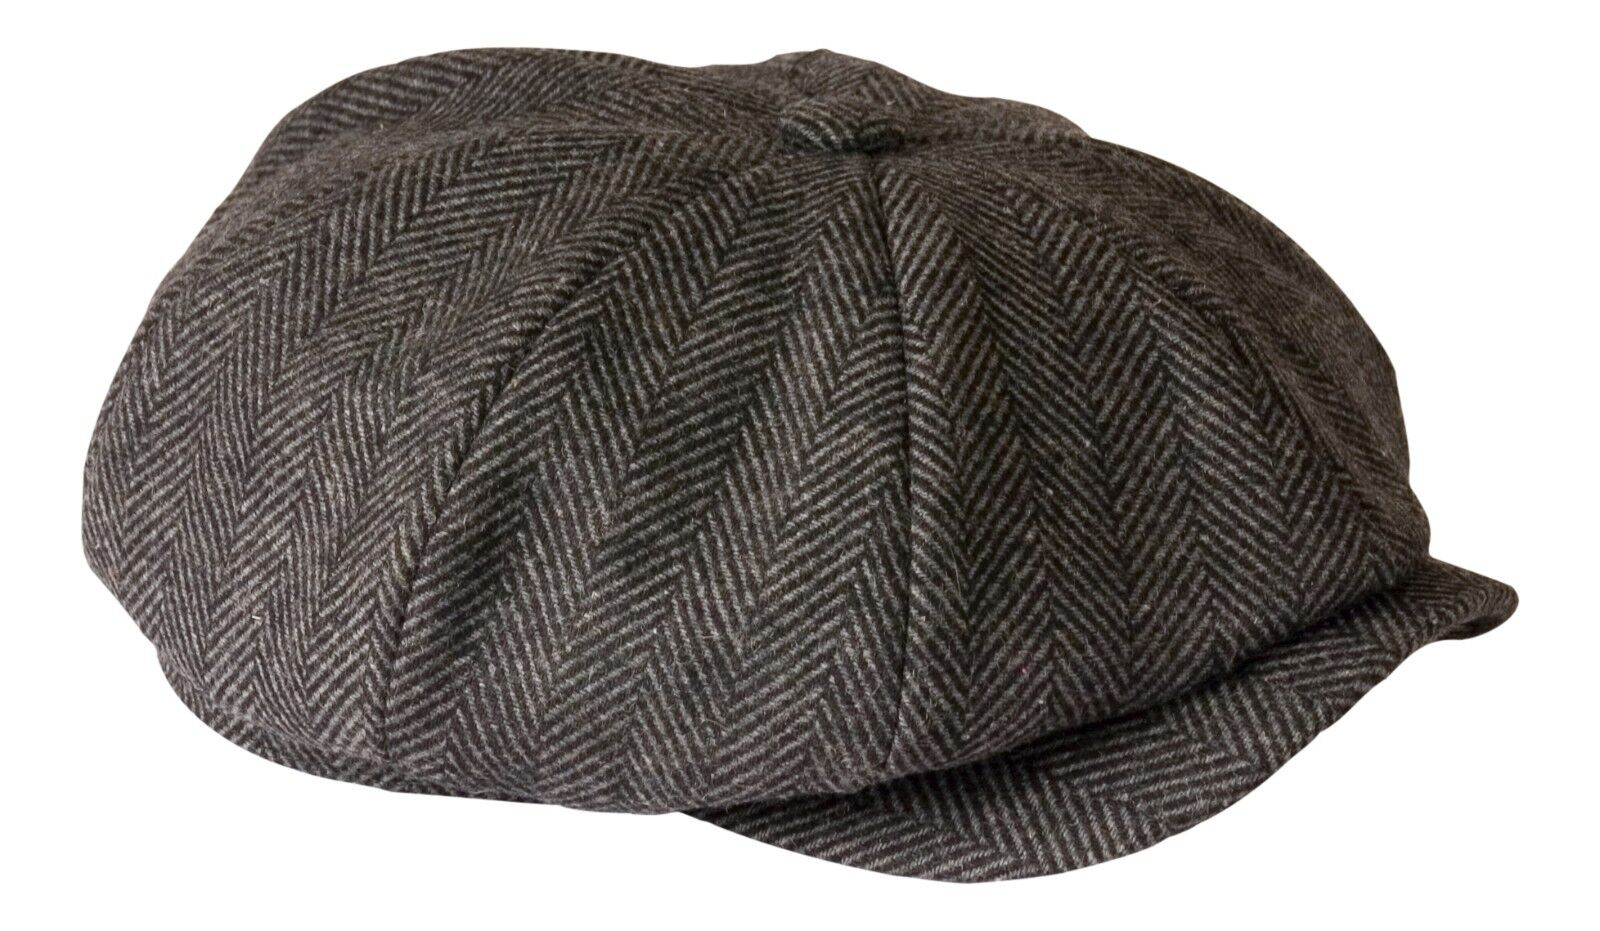 46eee4323e025 shelby  Grey Herringbone Wool Newsboy Button Top Flat Cap by Gamble ...